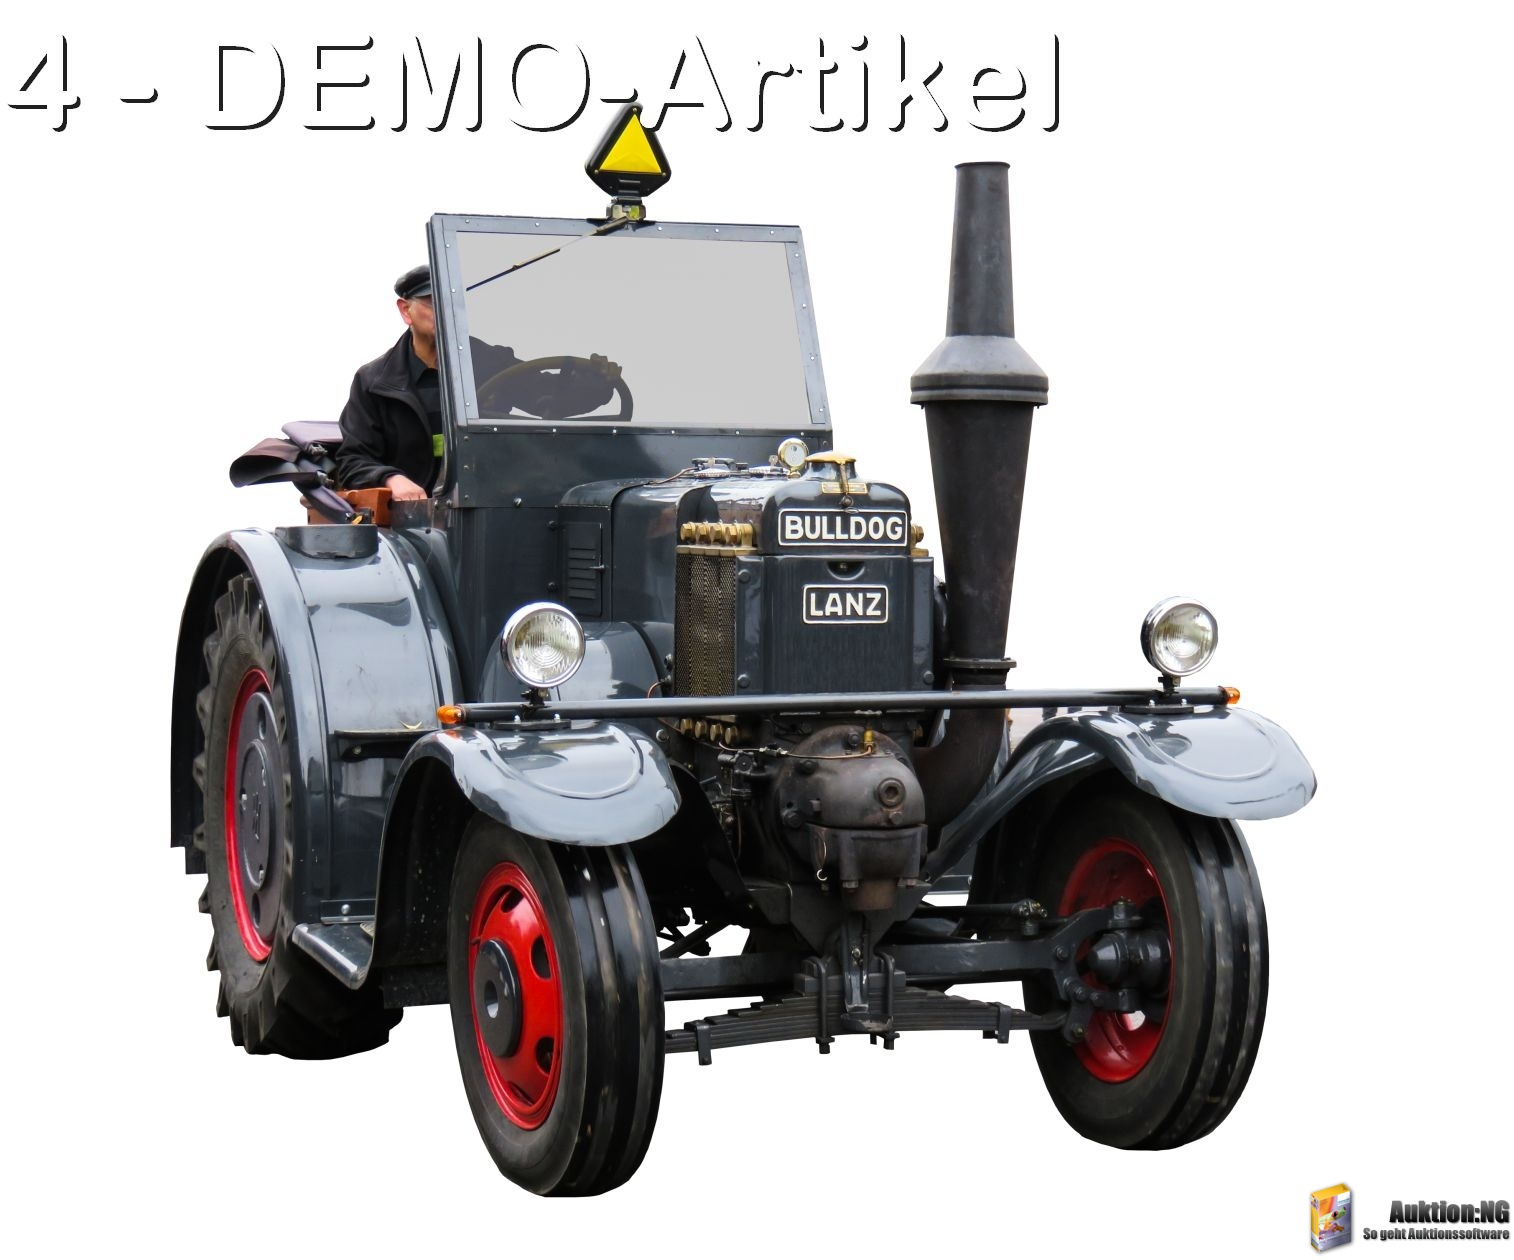 traktor lanz bulldog 2 auktion ng die neue generation. Black Bedroom Furniture Sets. Home Design Ideas